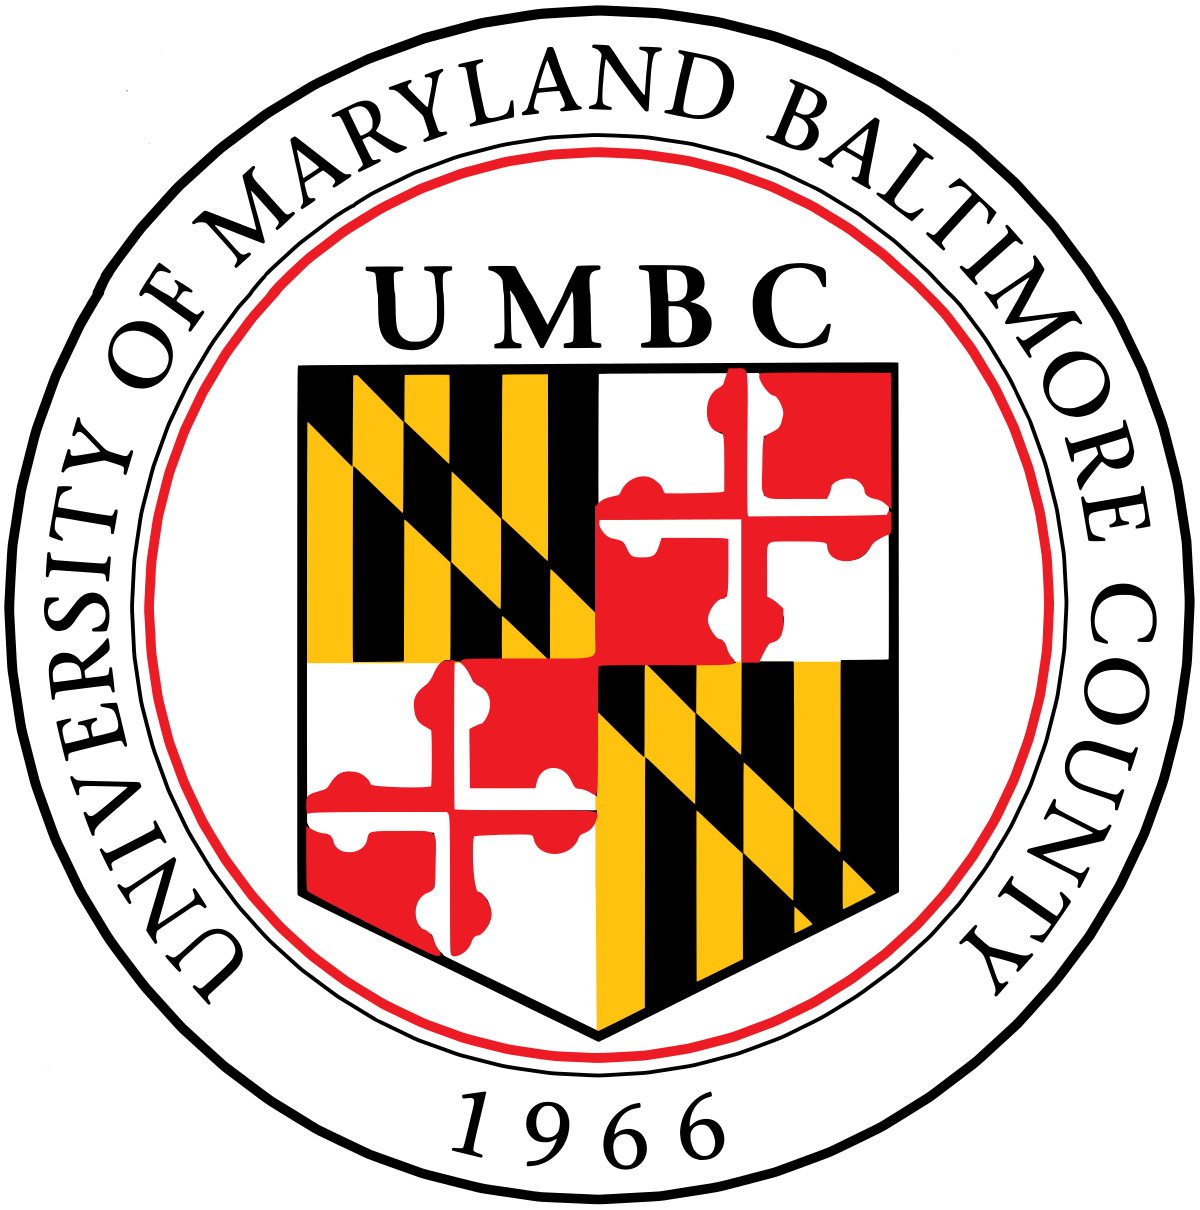 University of Maryland – Baltimore County